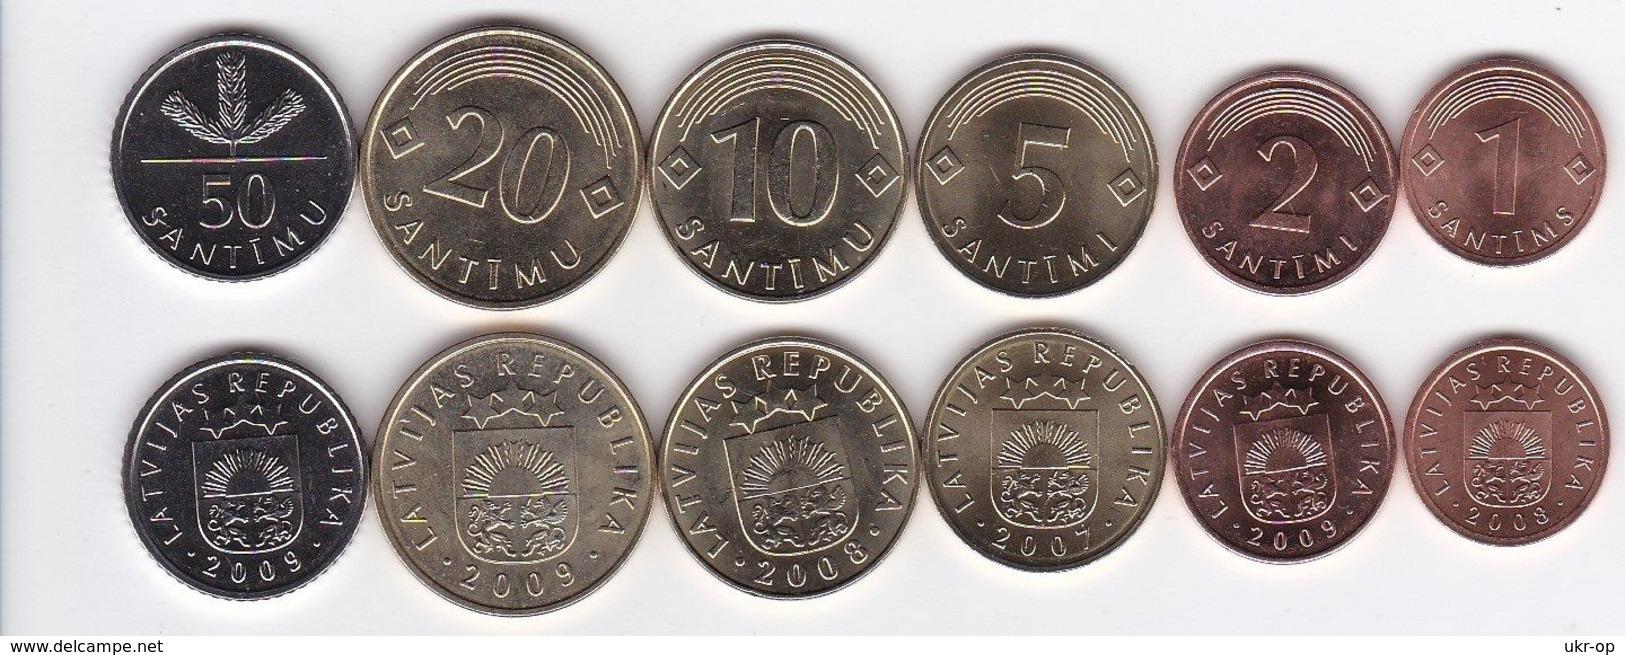 Latvia - 1 2 5 10 20 50 Santimu 2007 - 2009 UNC Set 6 Coins Ukr-OP - Lettland